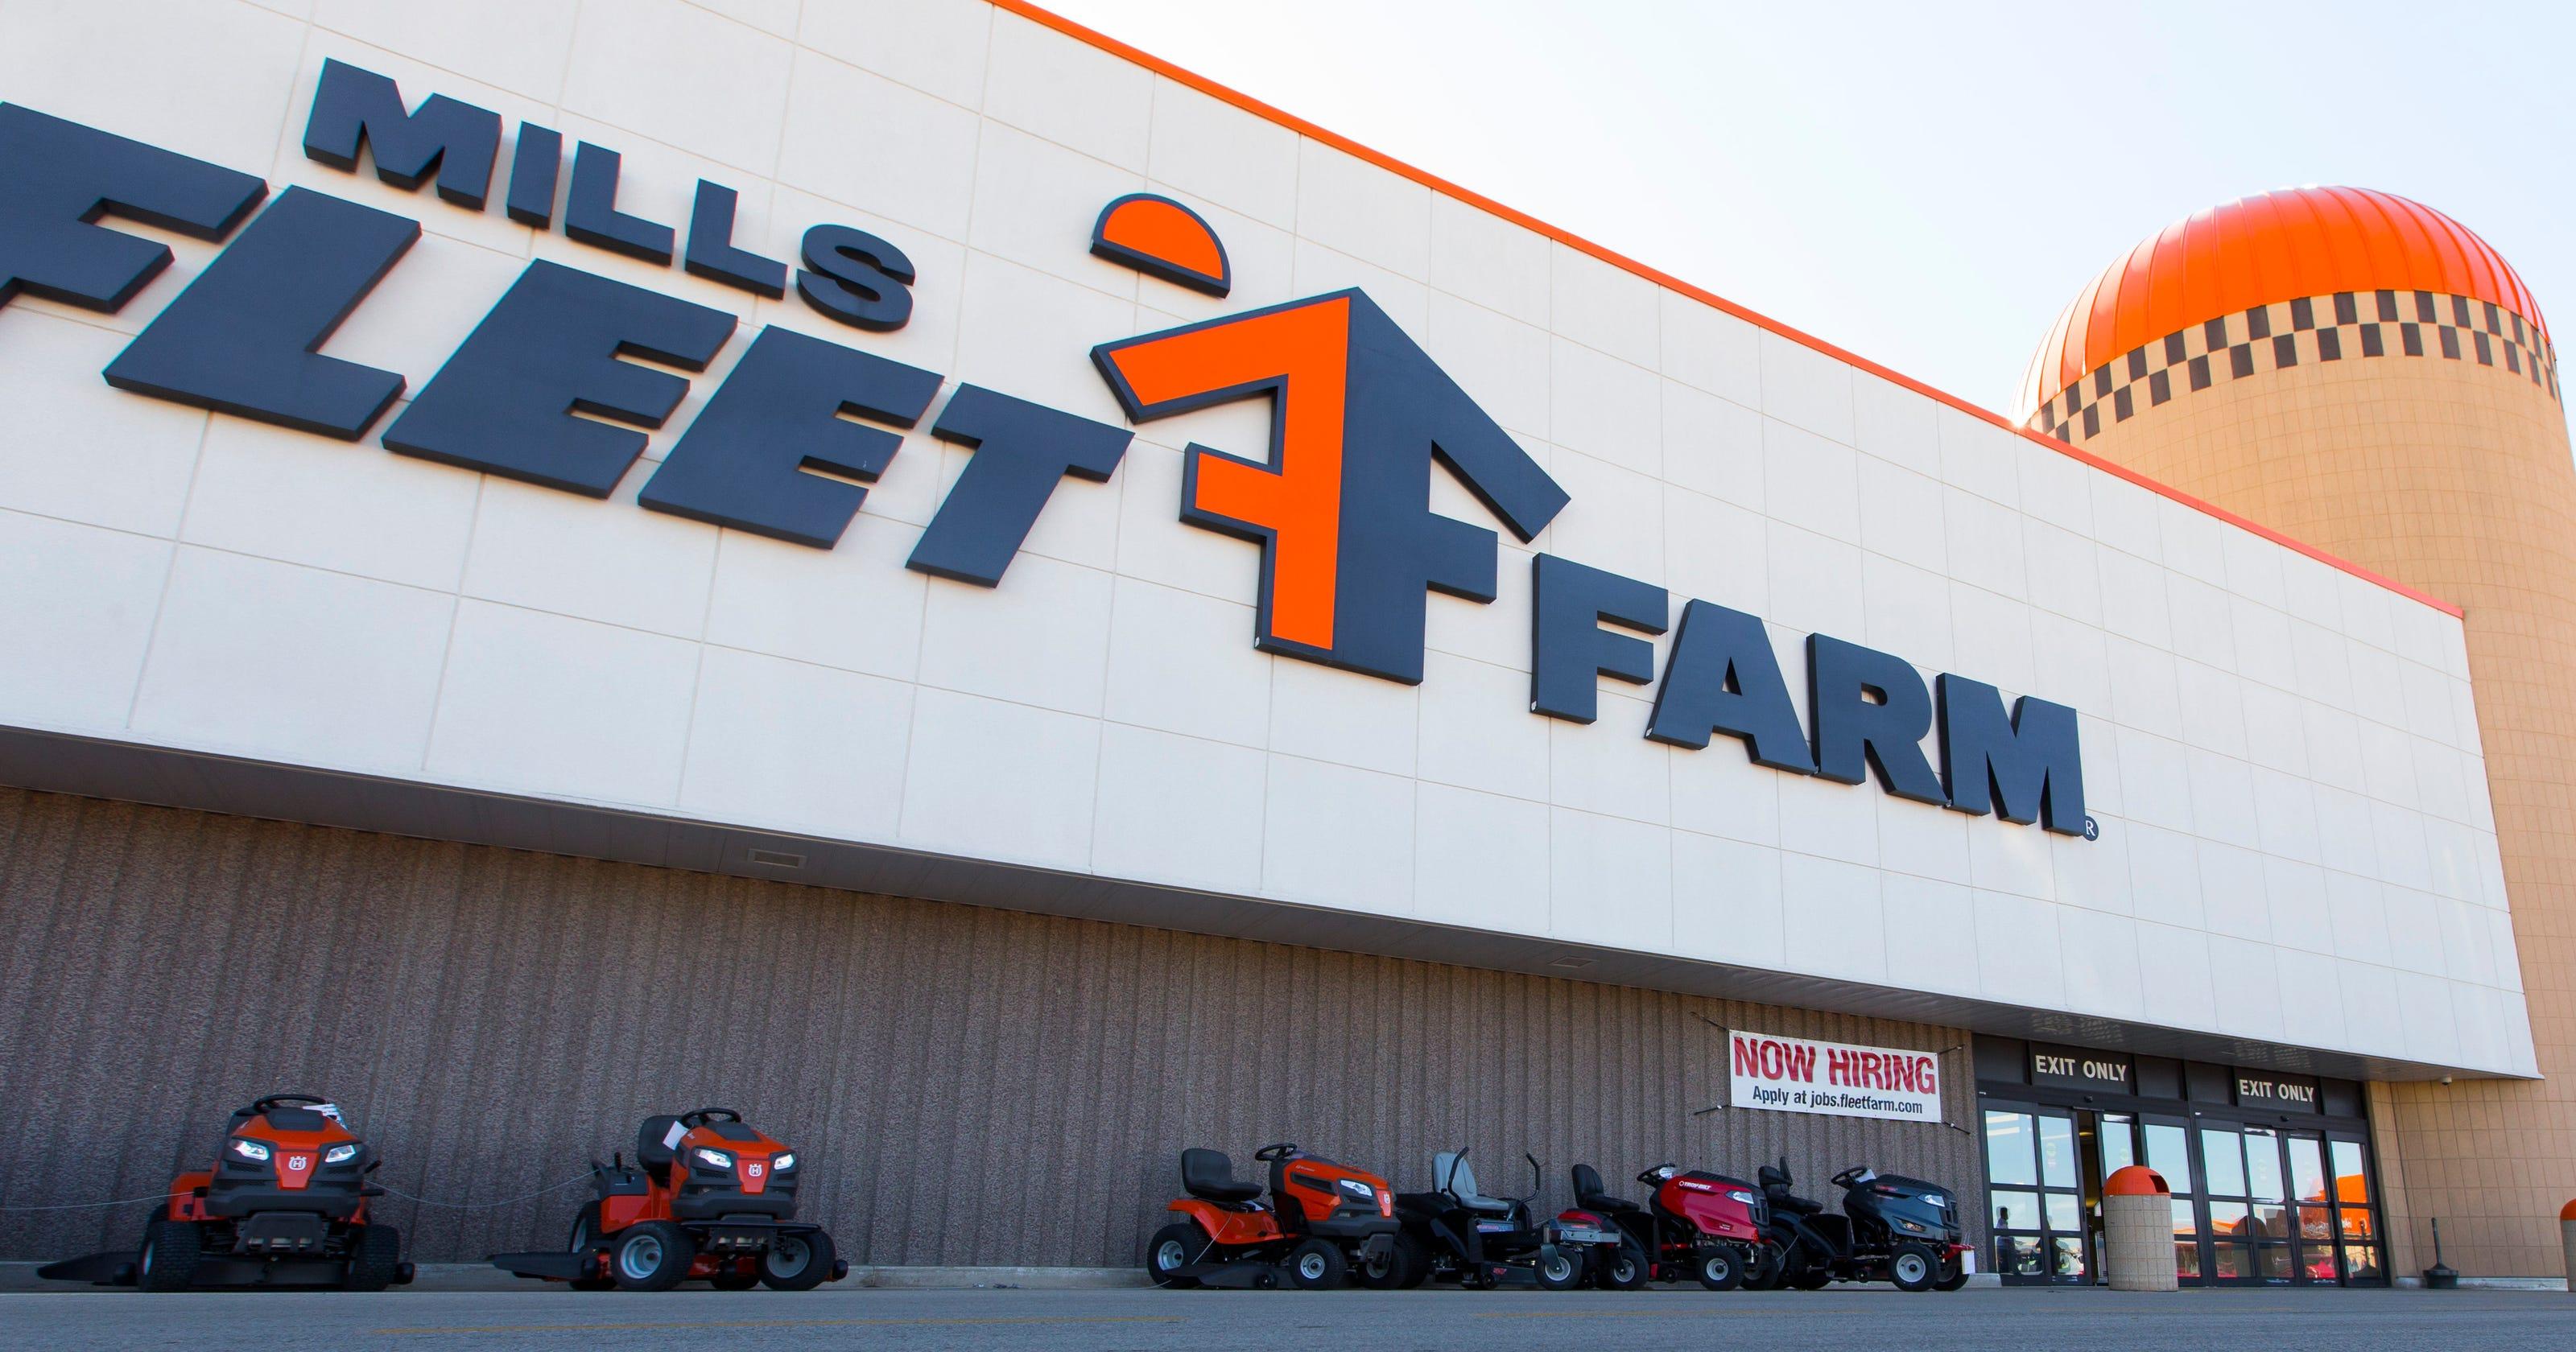 Mills Fleet Farm launches aggressive expansion plan, aiming